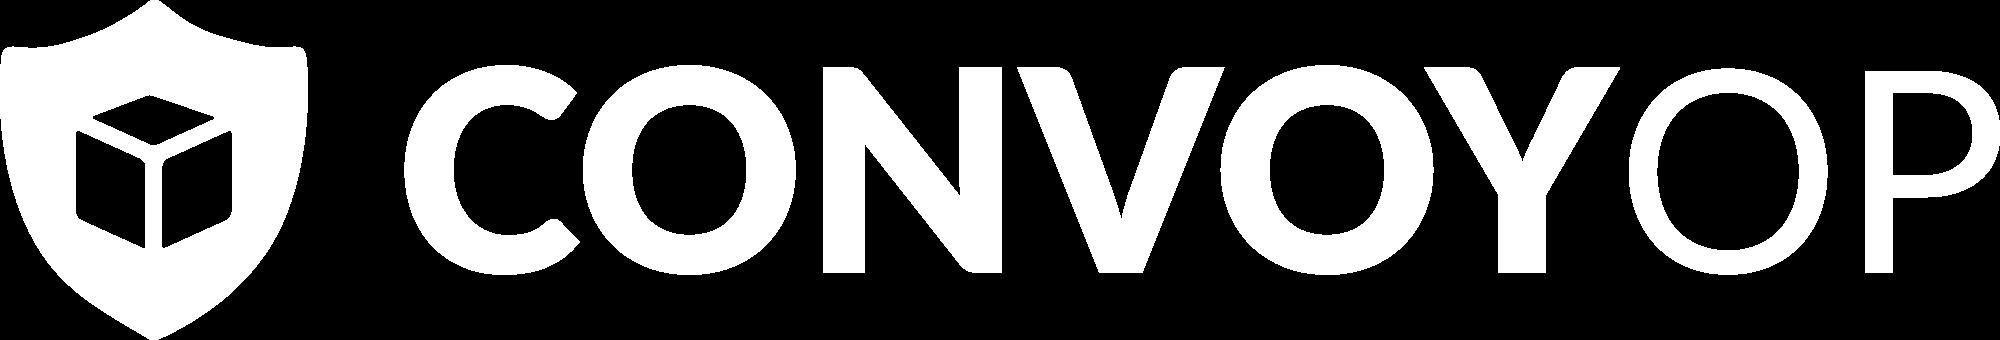 ConvoyOp logo